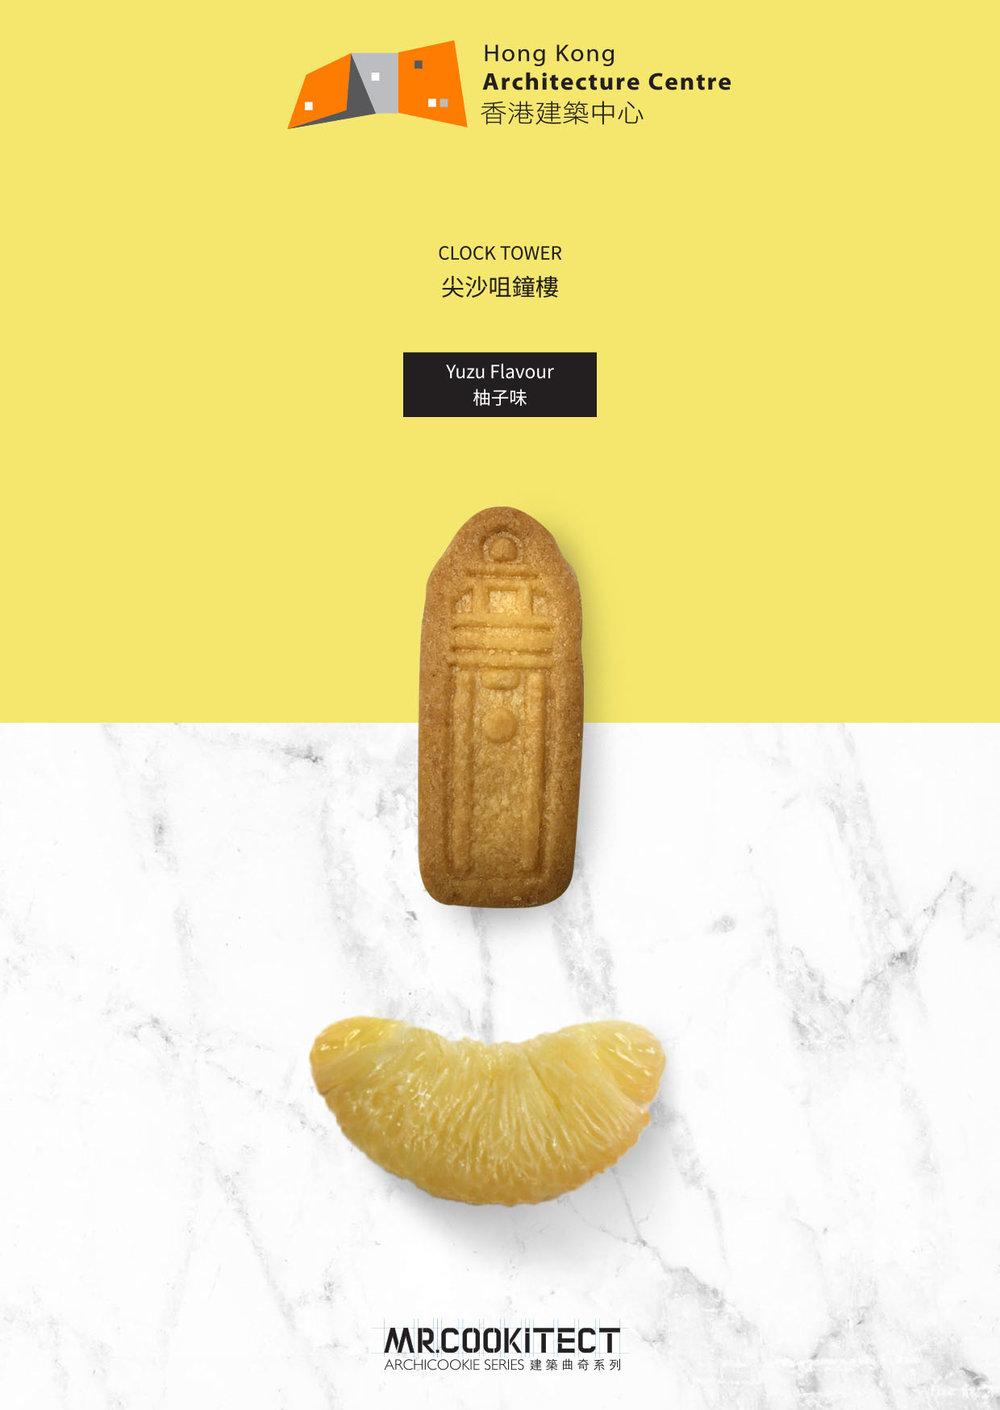 20160825-cookie flavour5.jpg